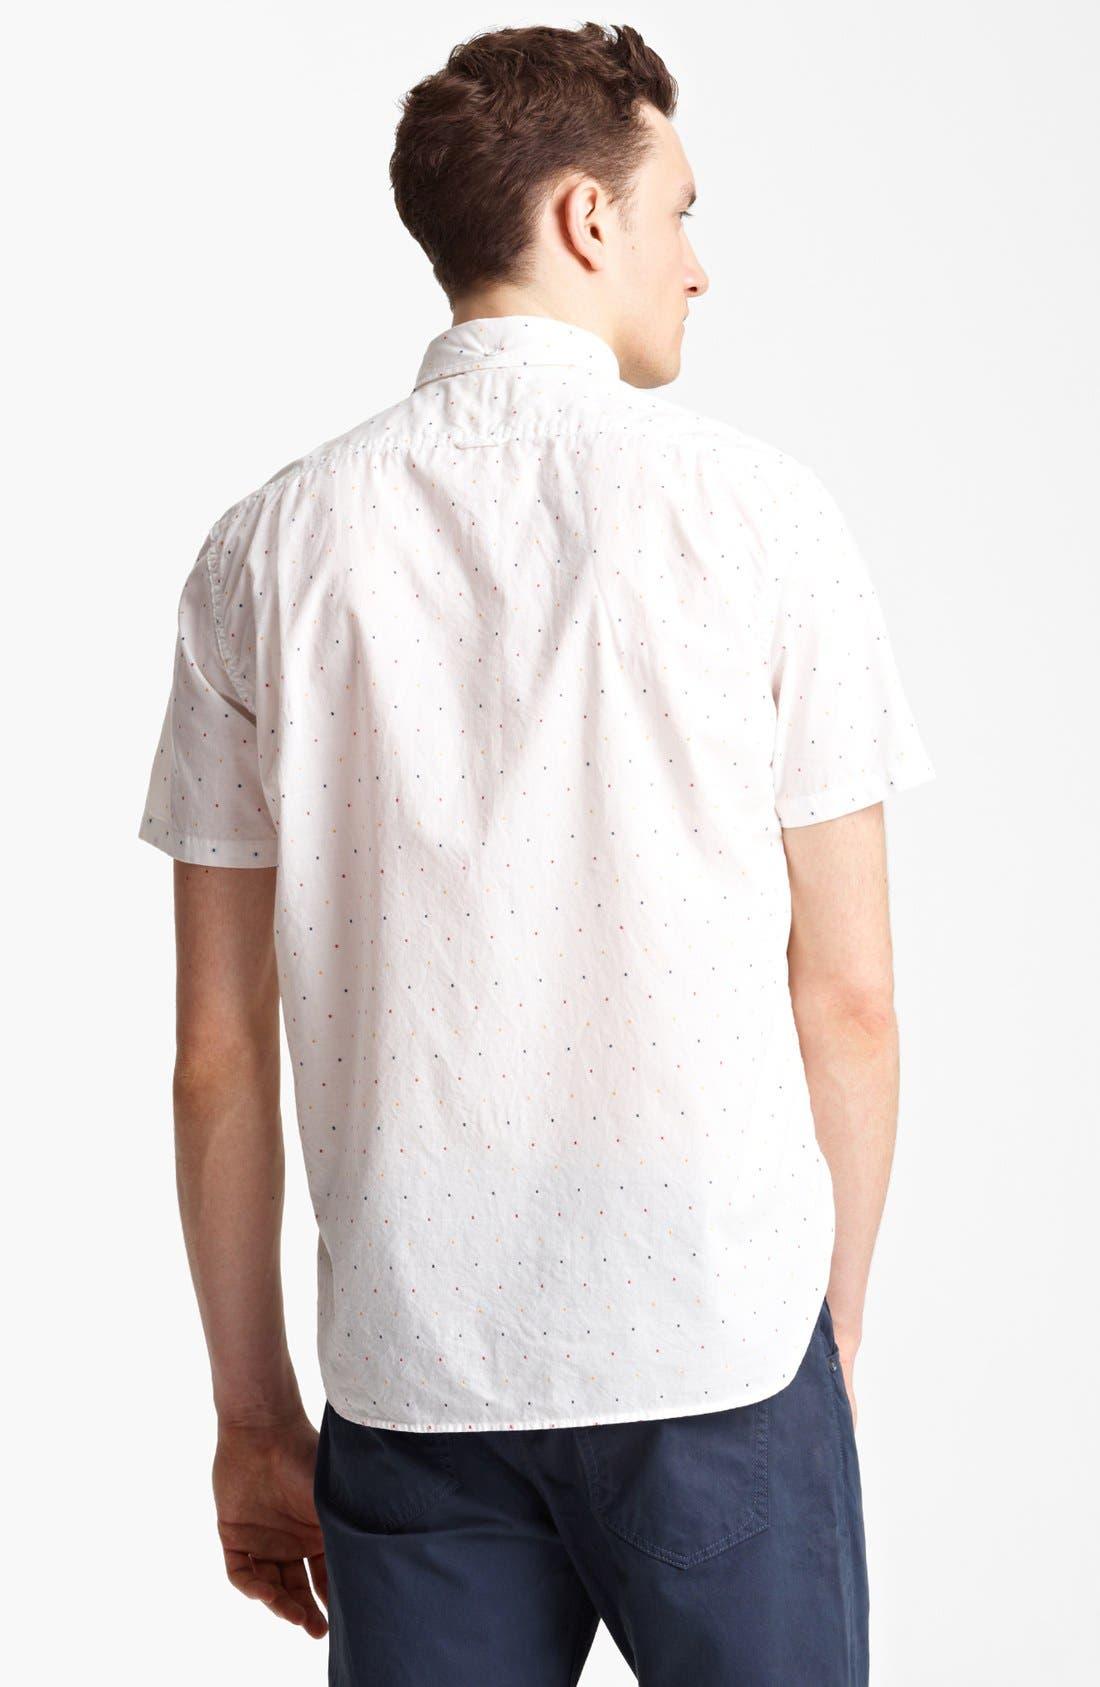 RAG & BONE, Dot Woven Shirt, Alternate thumbnail 2, color, 100